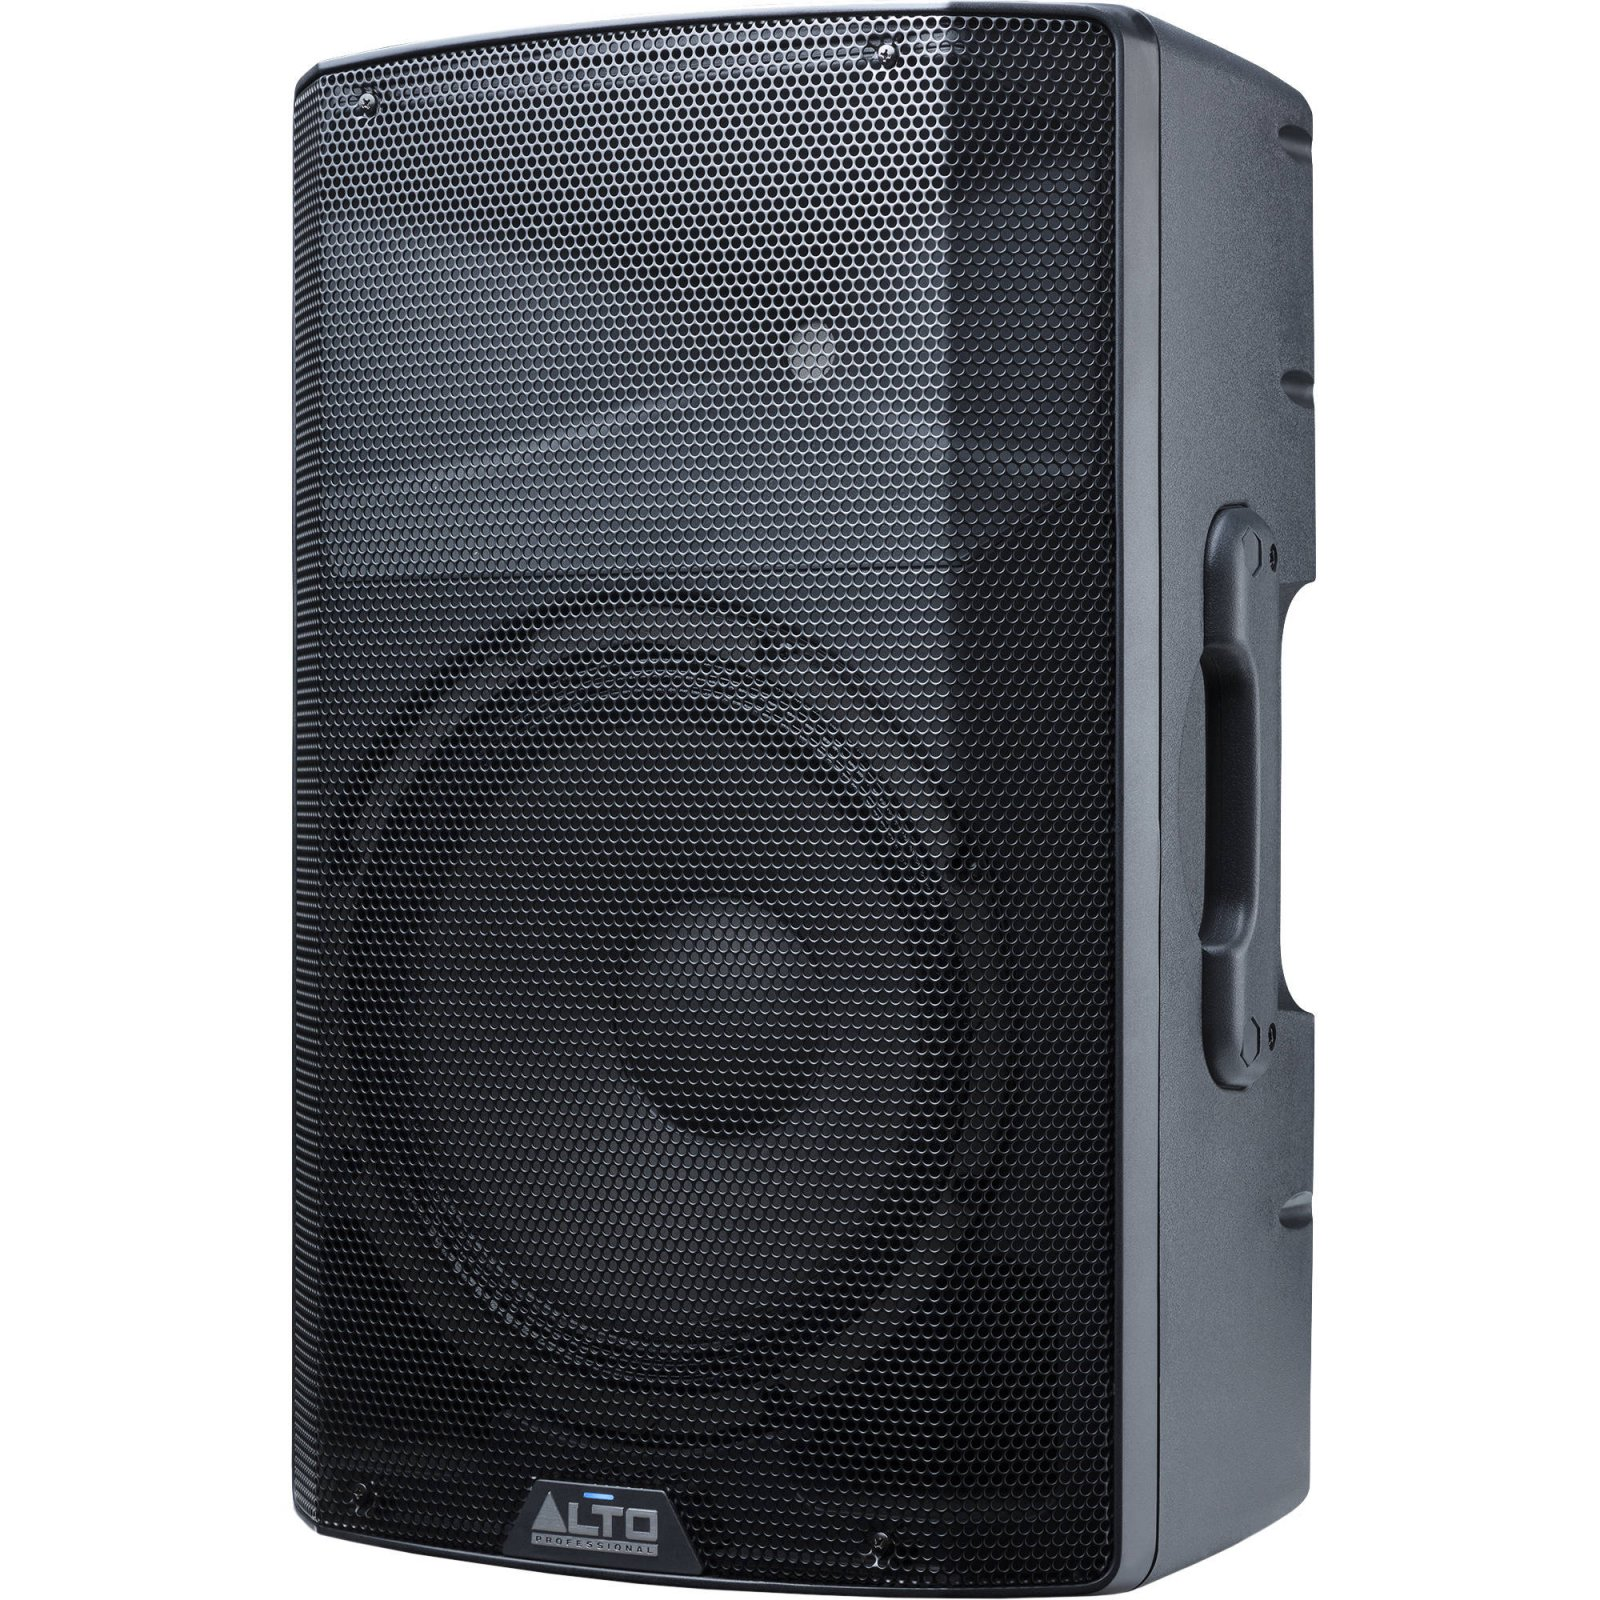 ALTO TX212 600W POWERED SPEAKER